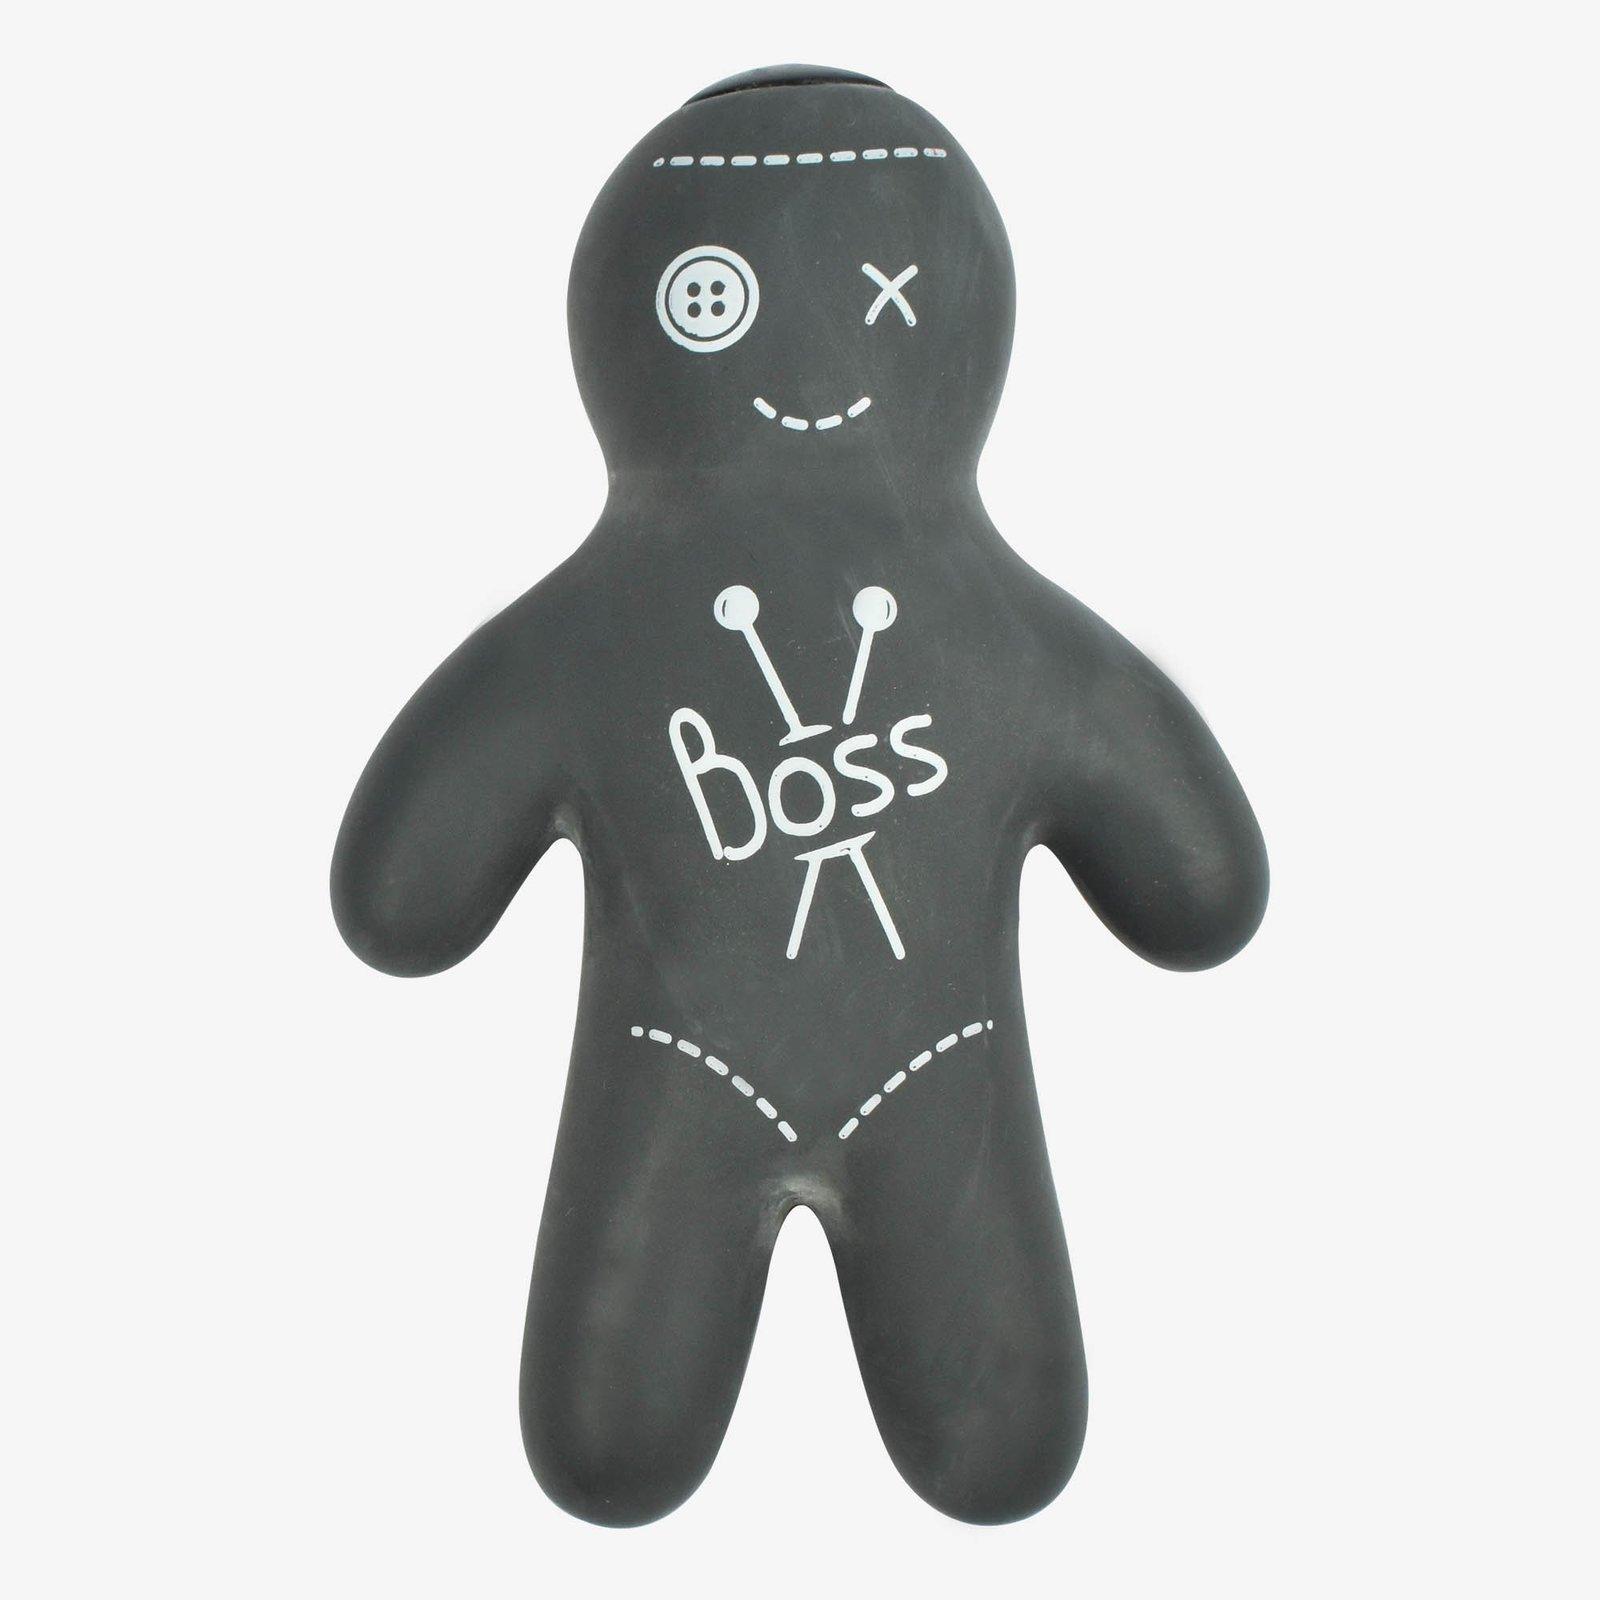 Legami: Antistress Ball - Boss Voodoo Doll